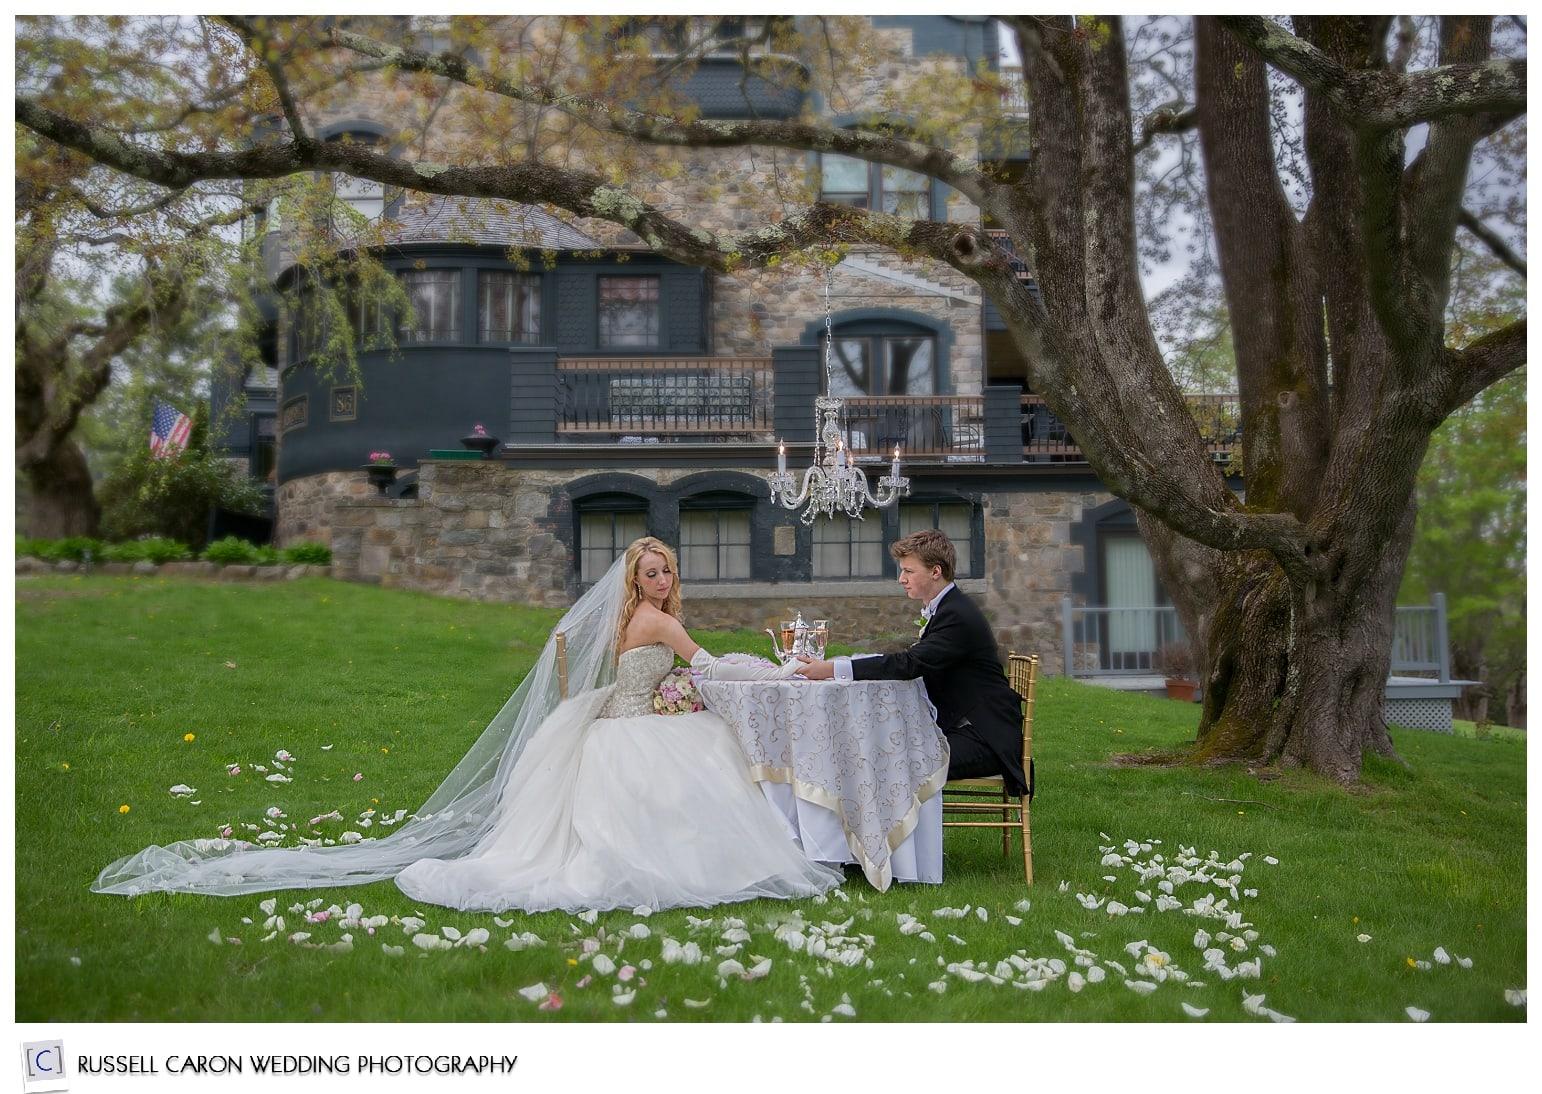 Intimate wedding at the Norumbega Inn, Camden Maine